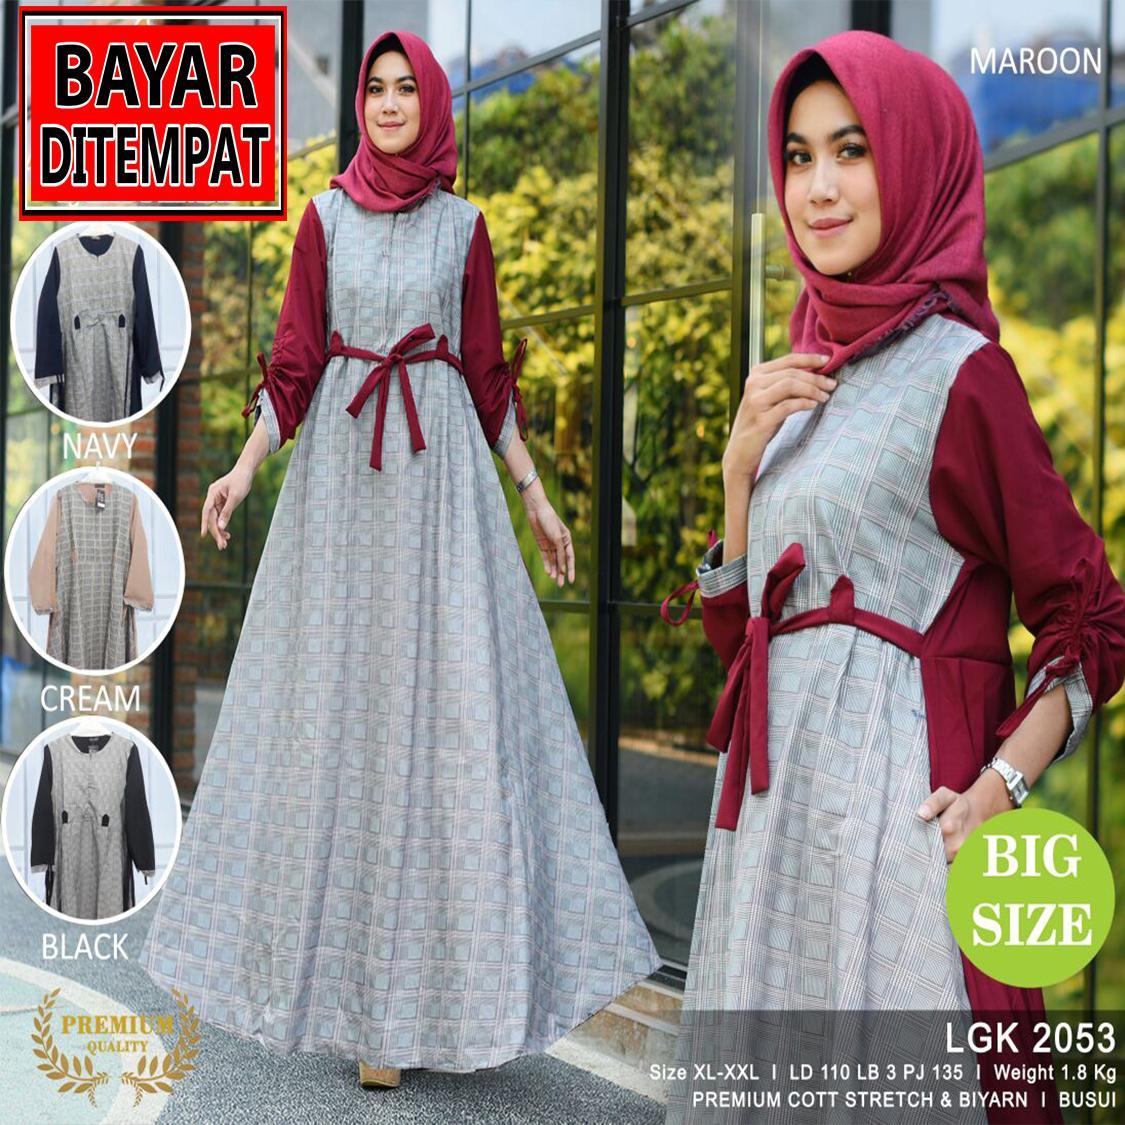 RATU SHOPPING Gamis jumbo size XL XXL Spesial lebaran baju muslim idul fitri ramadhan ceria LGK2053